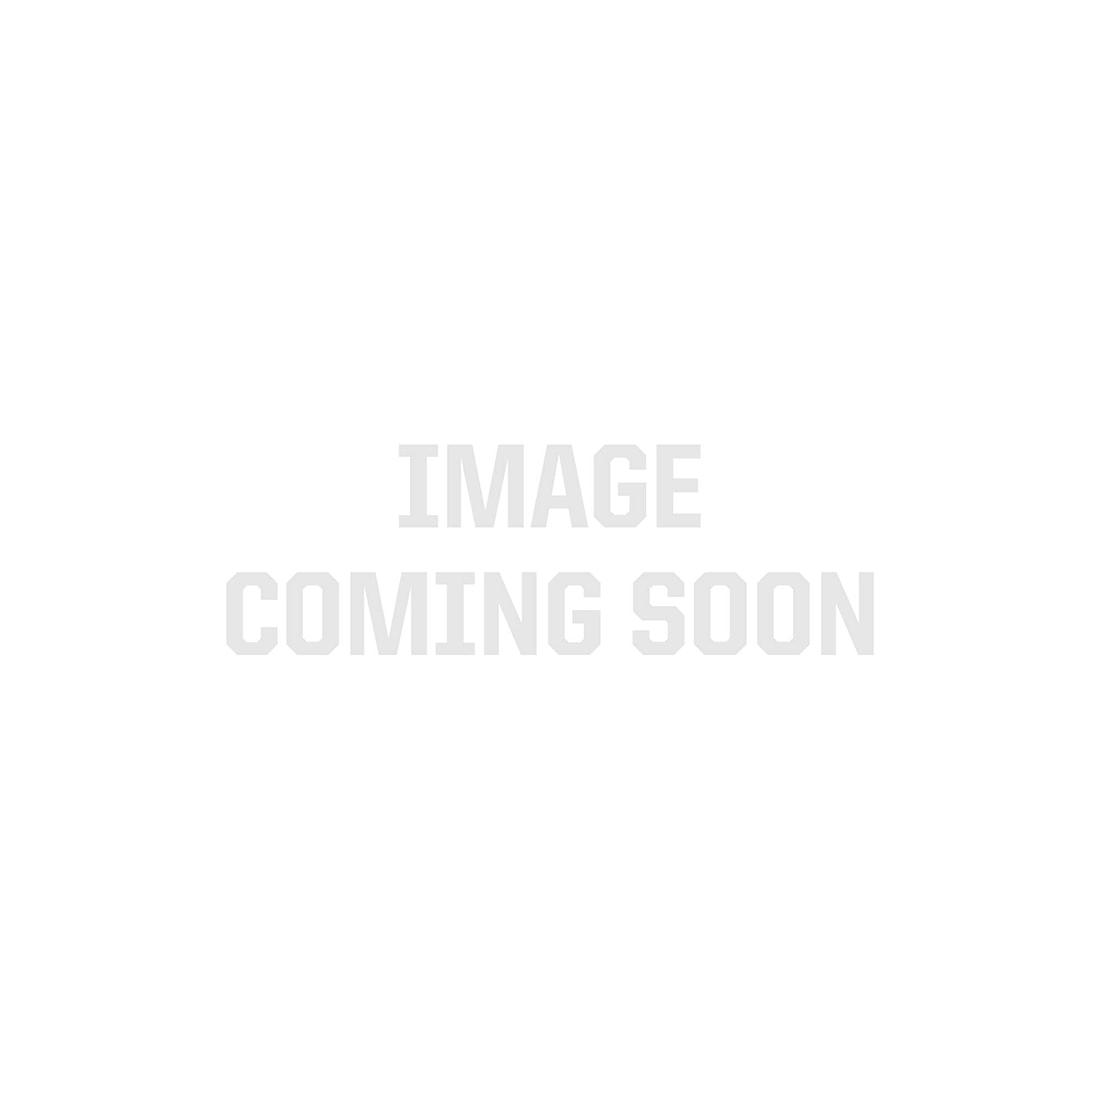 MicroMax VLM LED Driver - 12 VDC - 60W